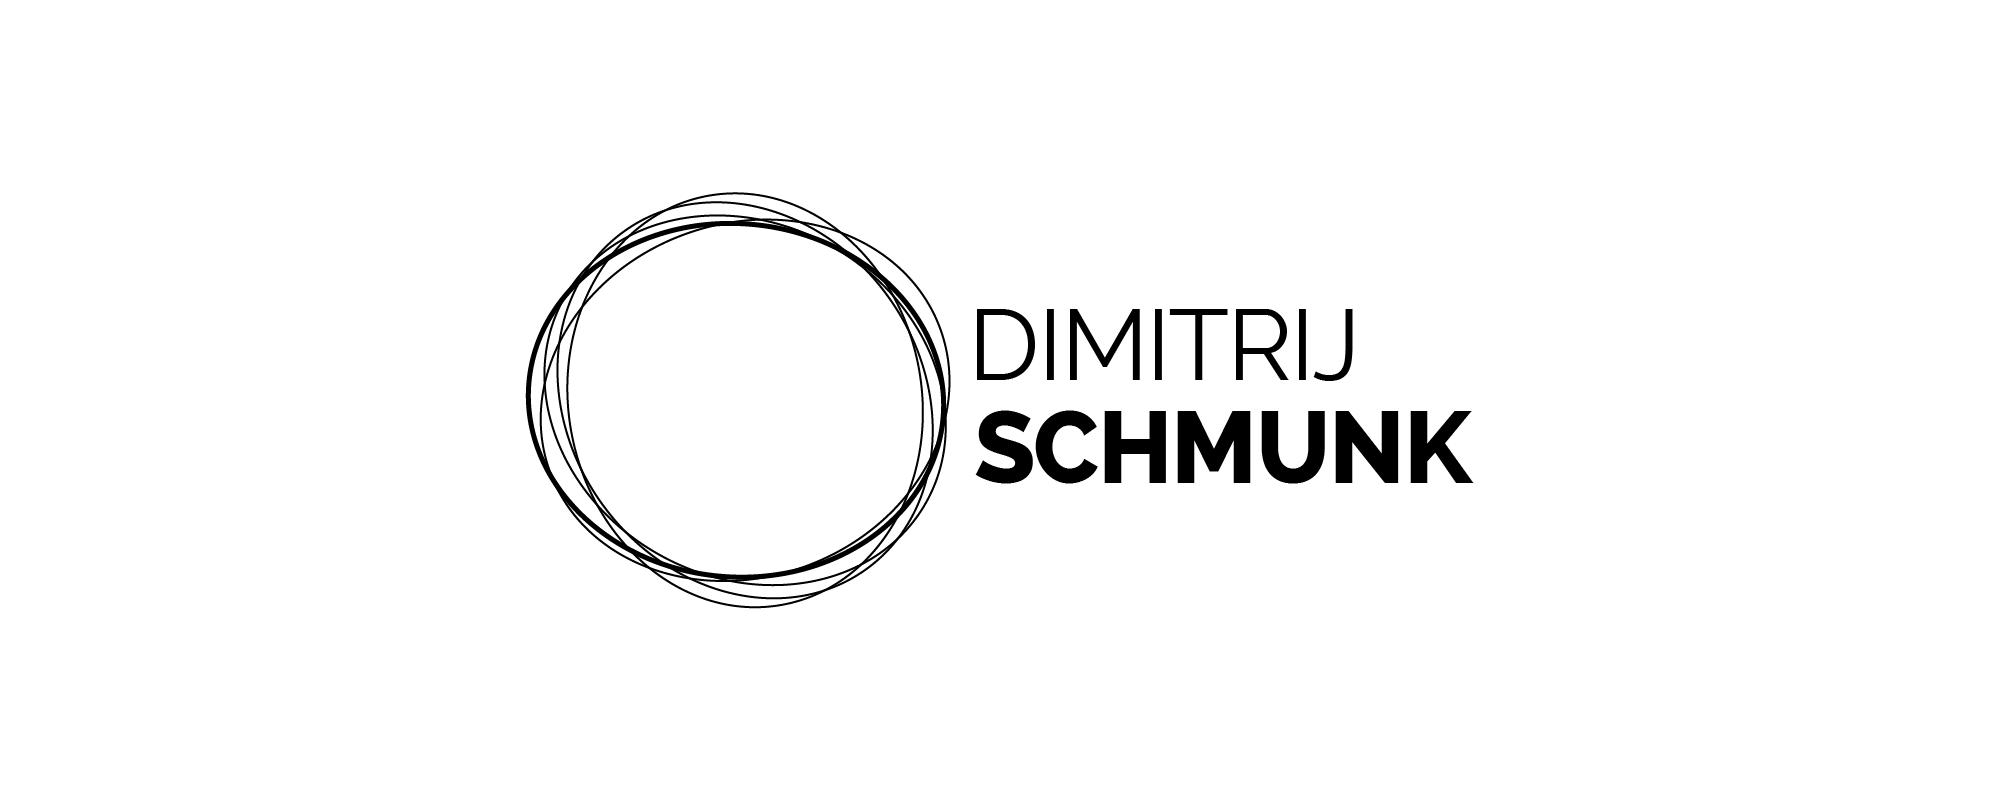 logo-dimitrij-schmunk-final-web-20